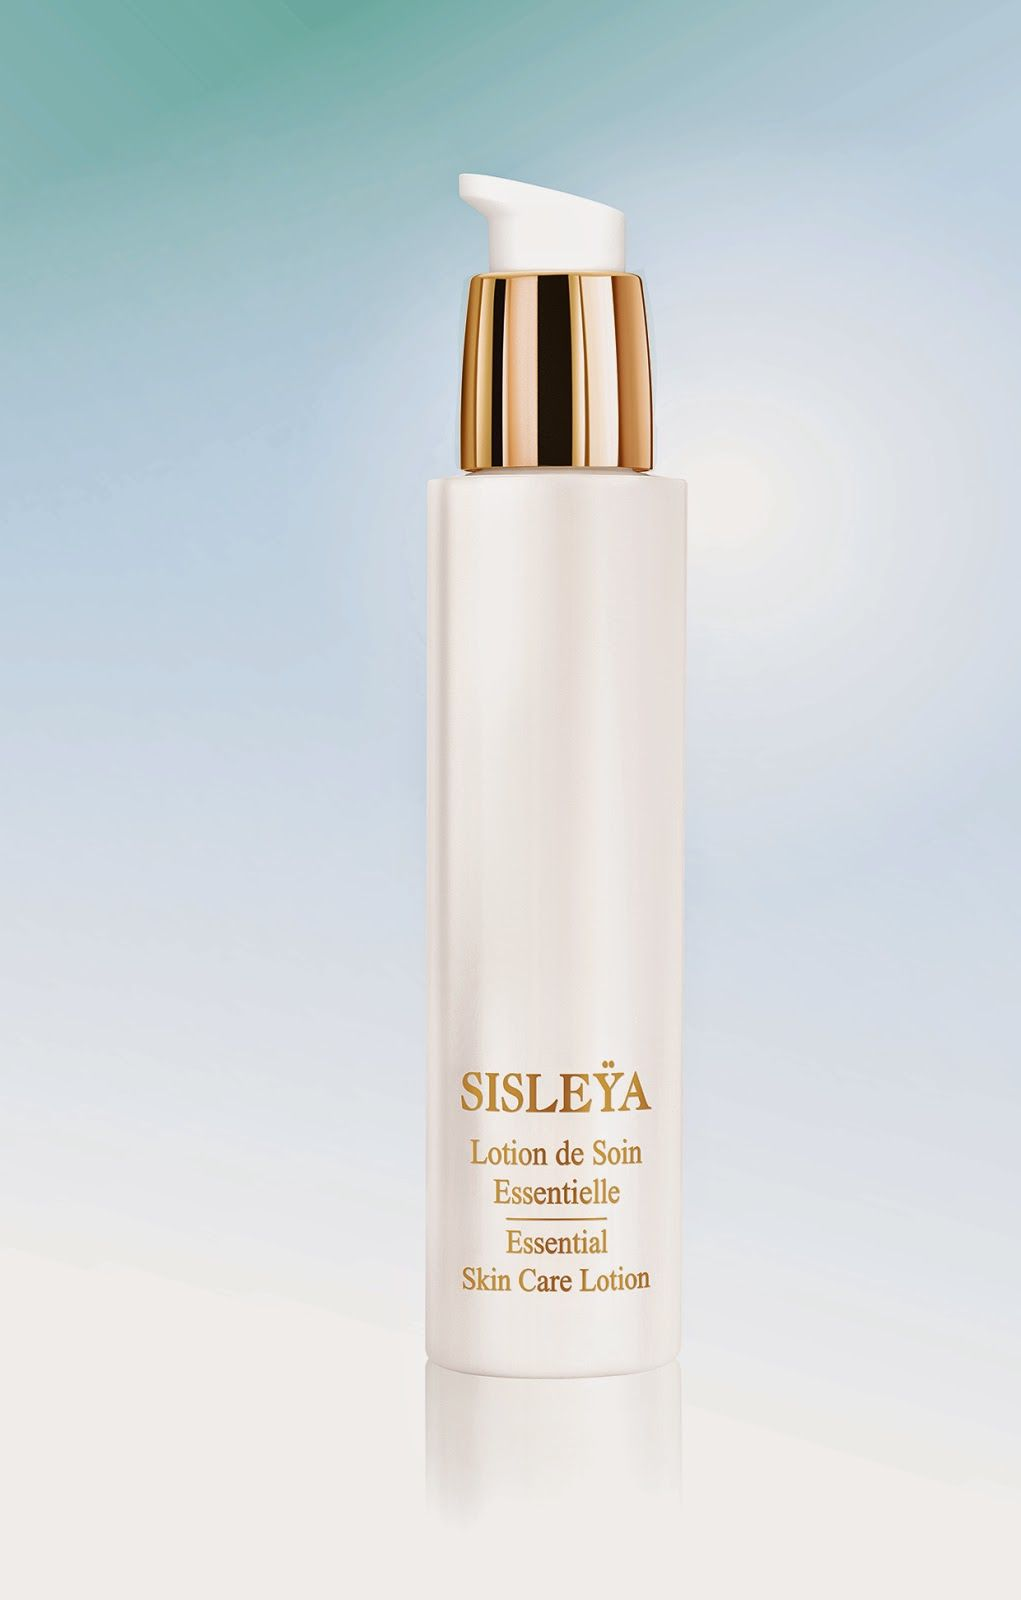 The Blog Luxury By Savas La Lotion De Soin Essentielle Sisleya